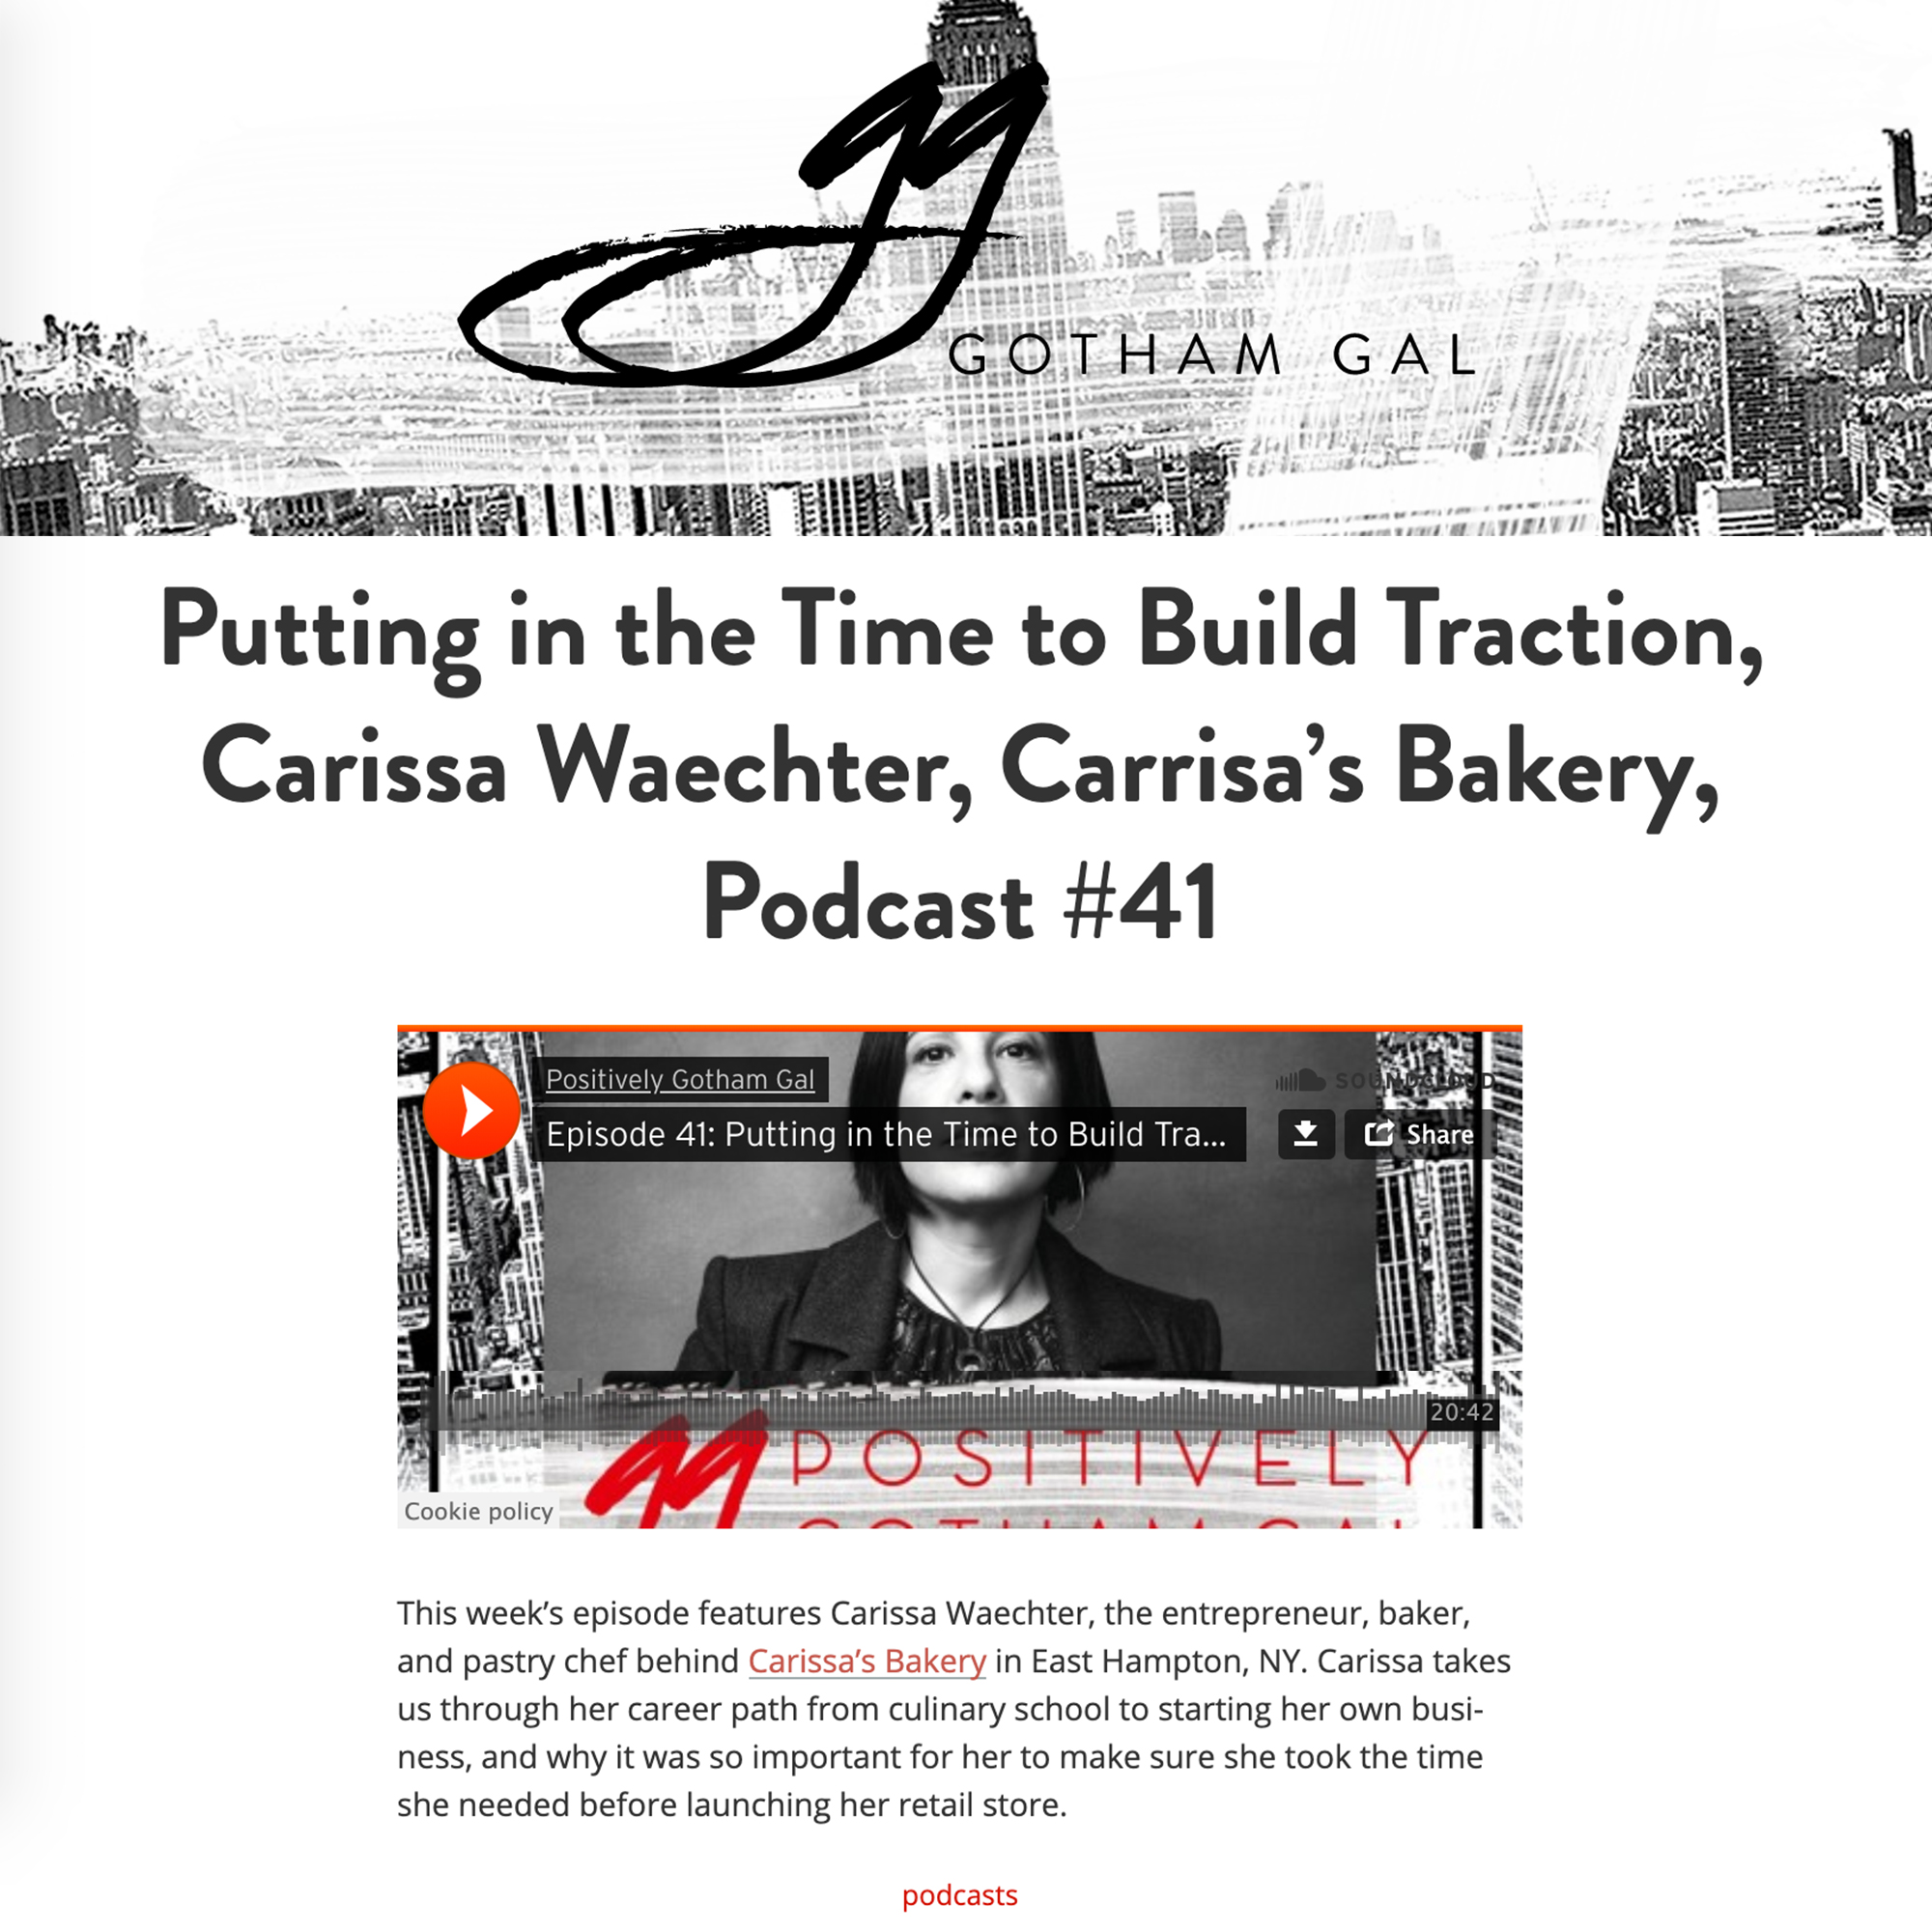 Gotham Gal Podcast